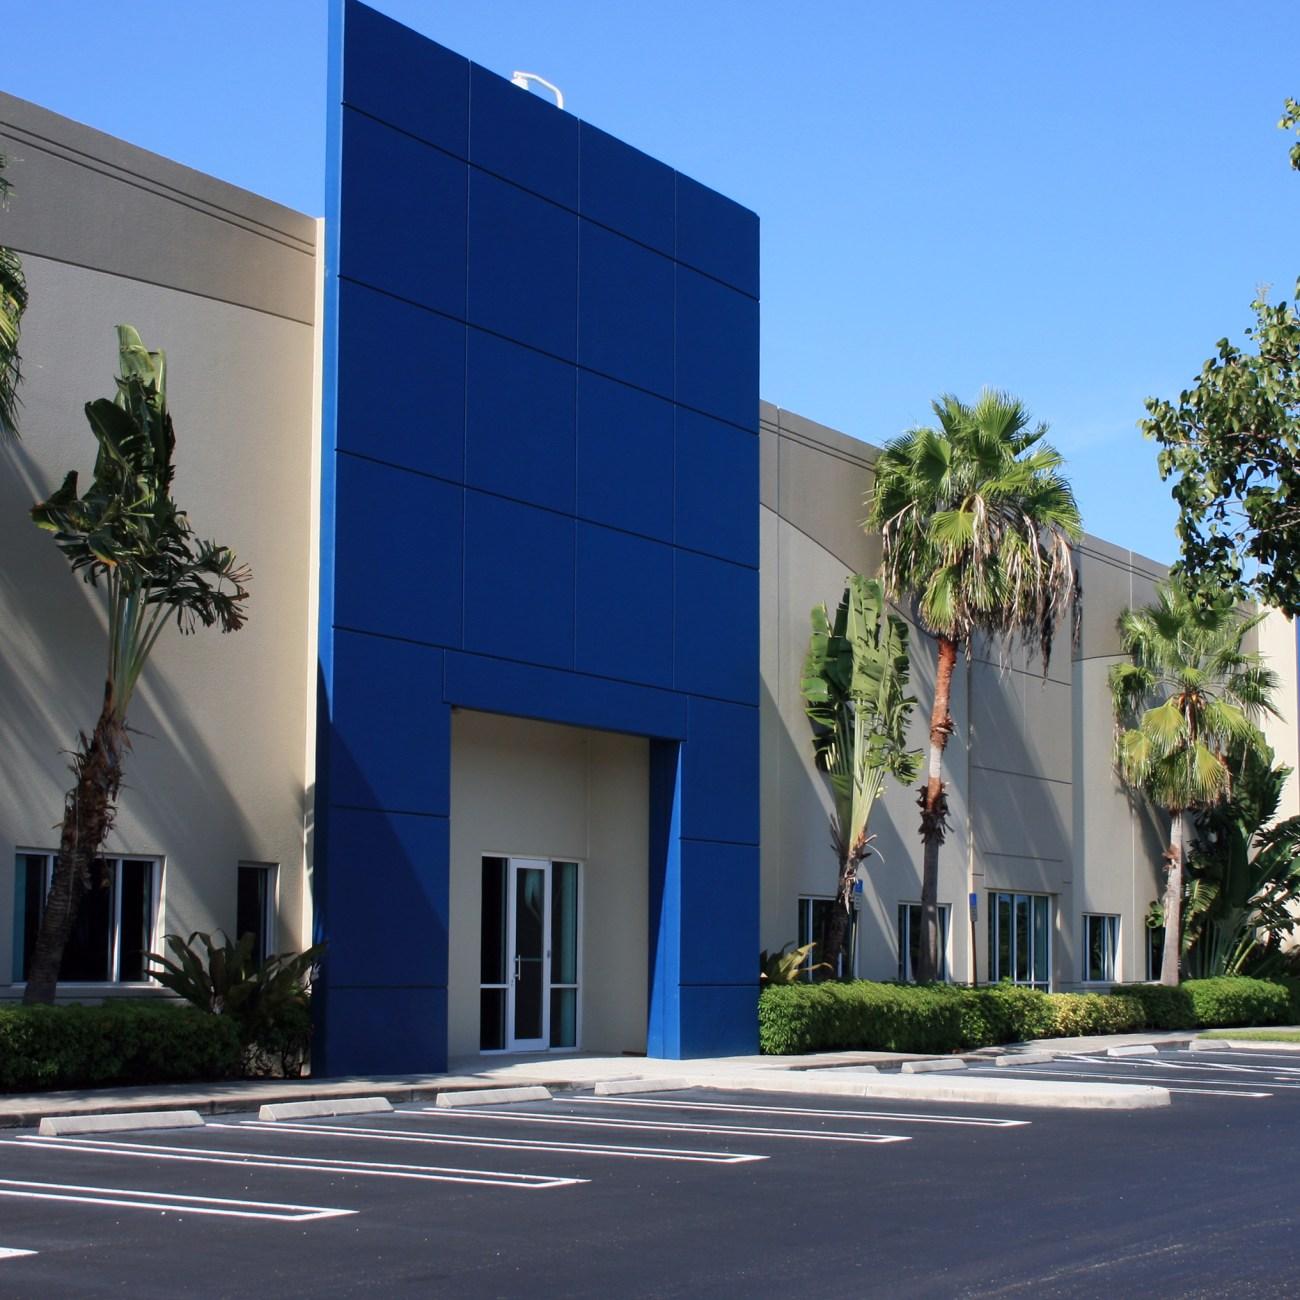 Cushman & Wakefield Brings Boynton Commerce Center to Full Occupancy